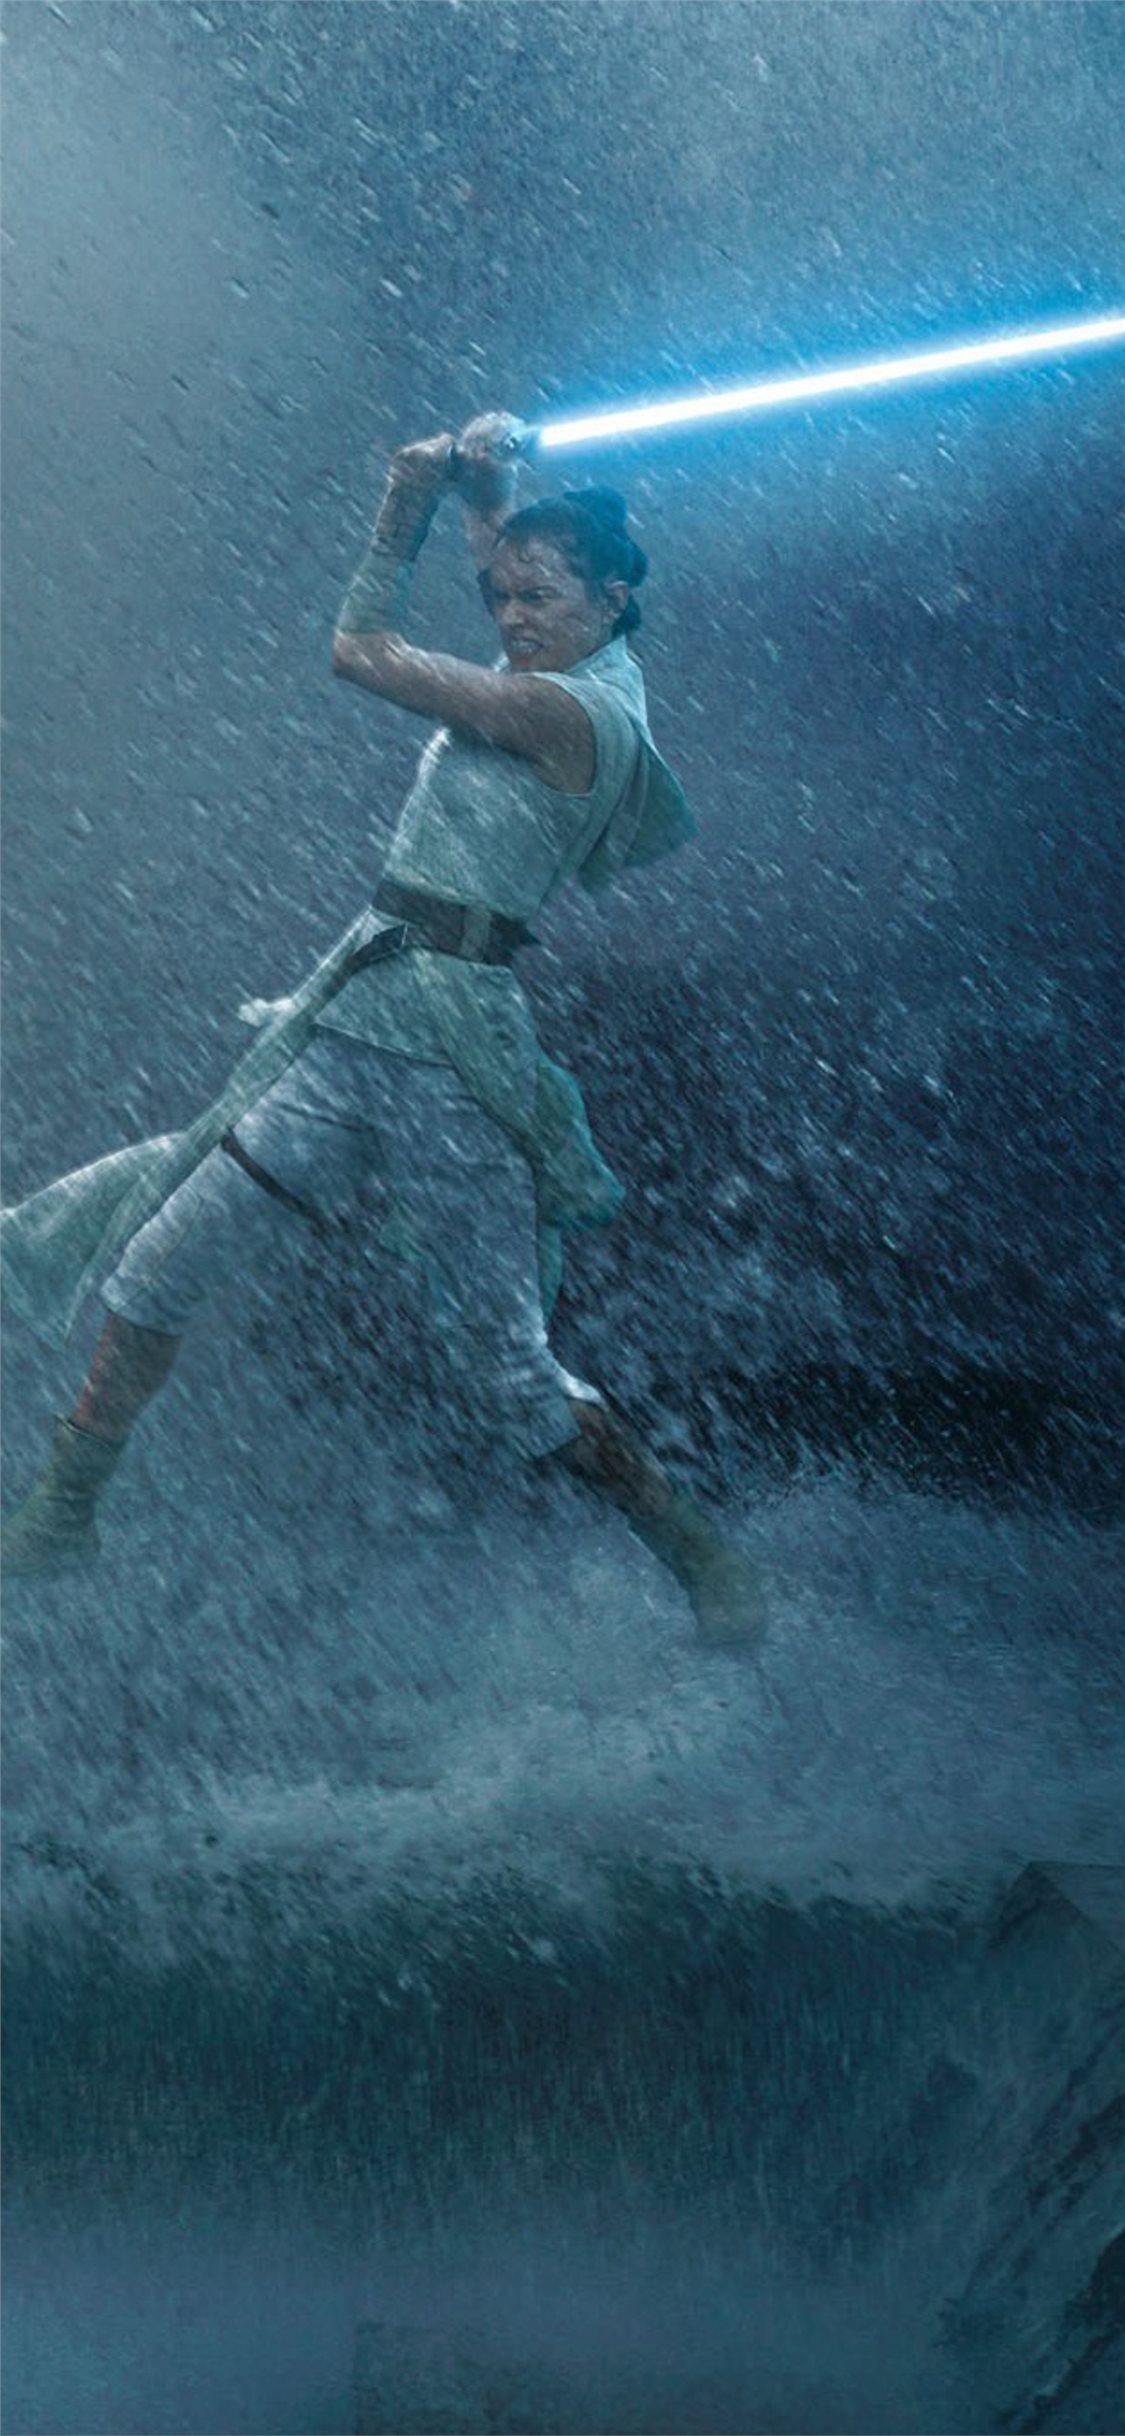 Rey Vs Kylo Ren Star Wars The Rise Of Skywalker Iphone X